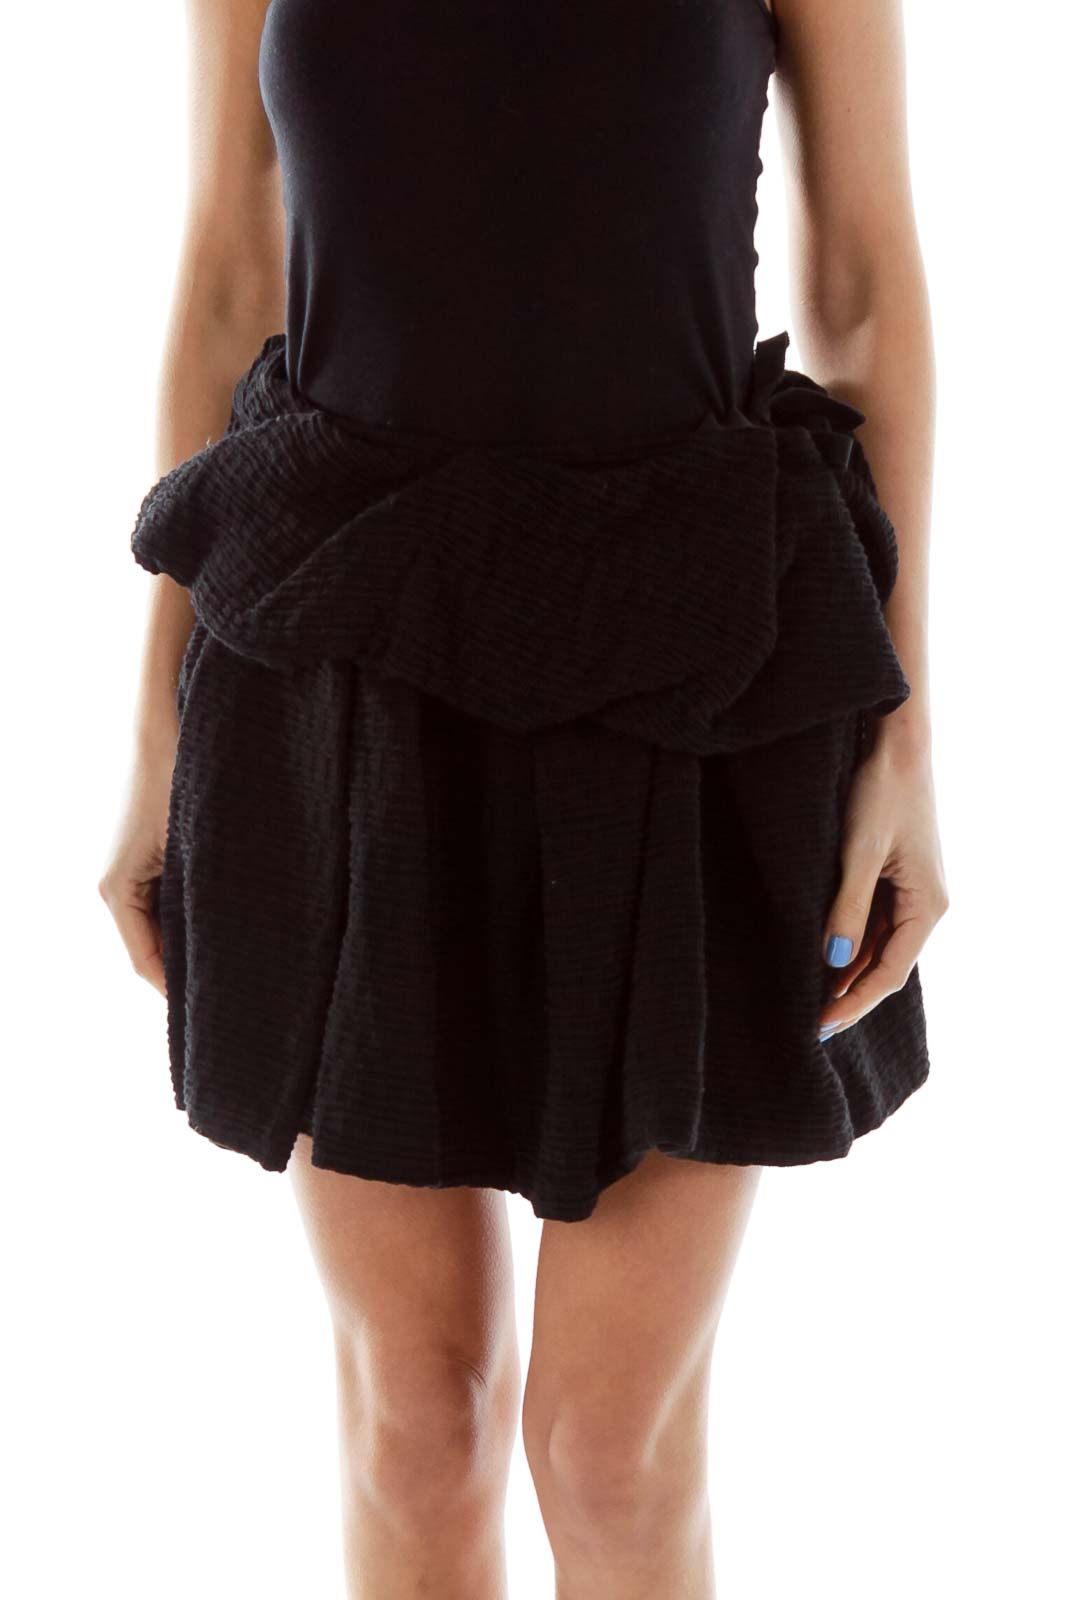 Black Textured Layered Mini Skirt Front